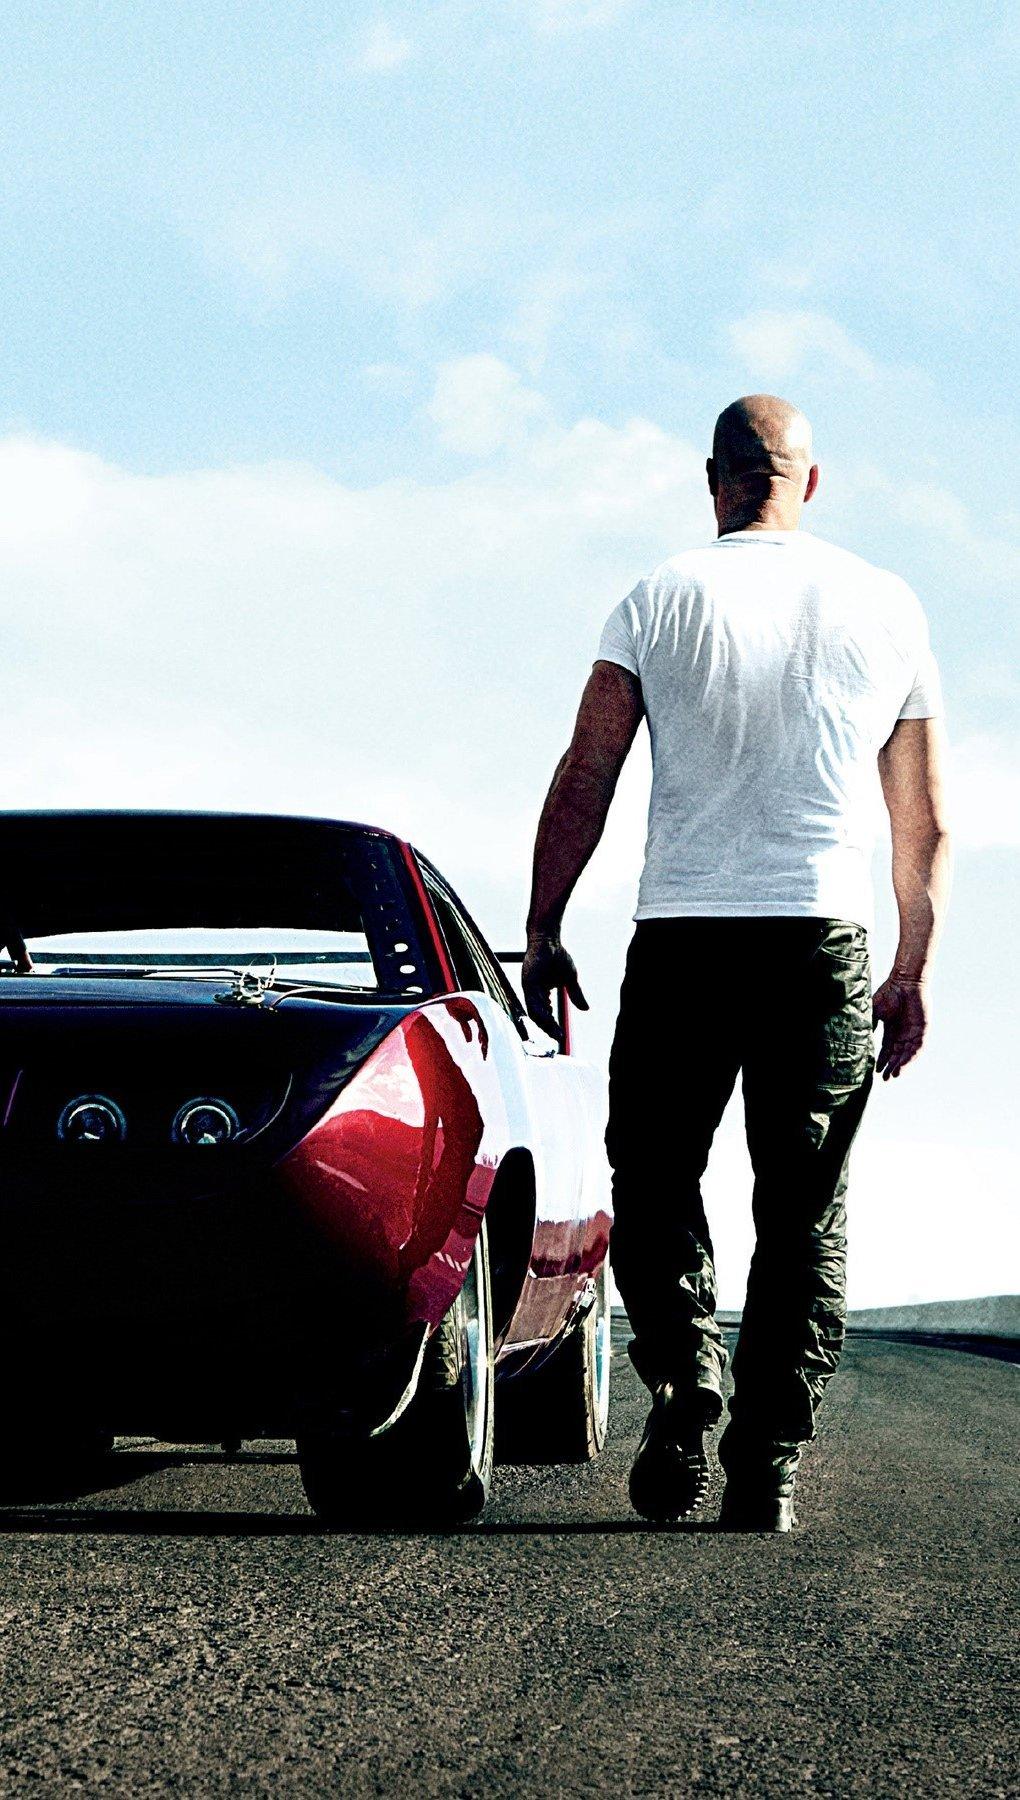 Wallpaper Vin Diesel in Fast and Furious 6 Vertical